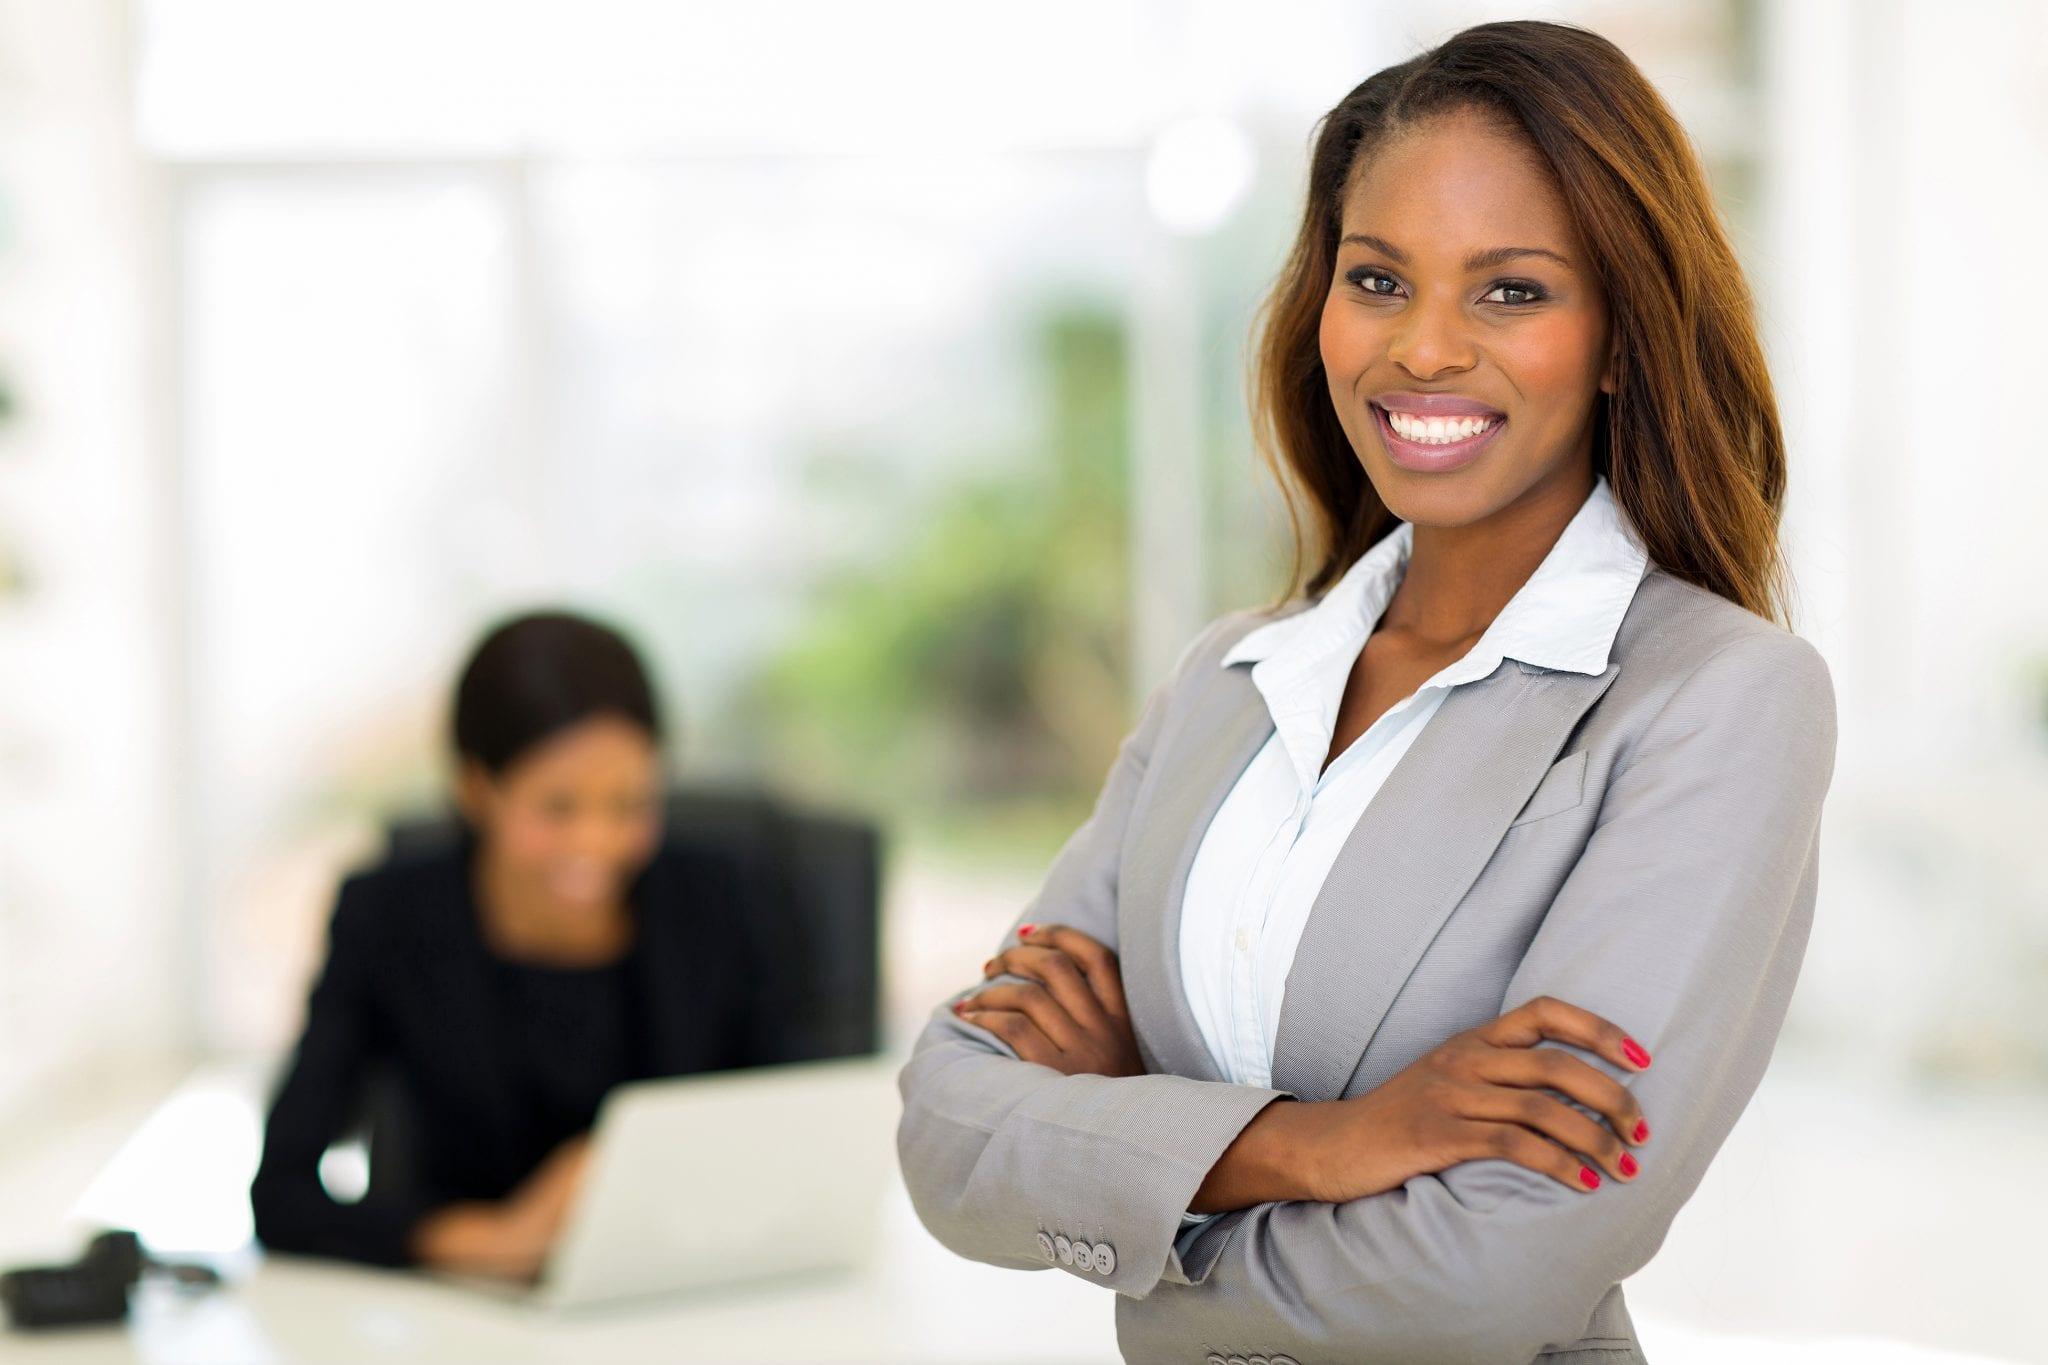 Women and Executive Presence